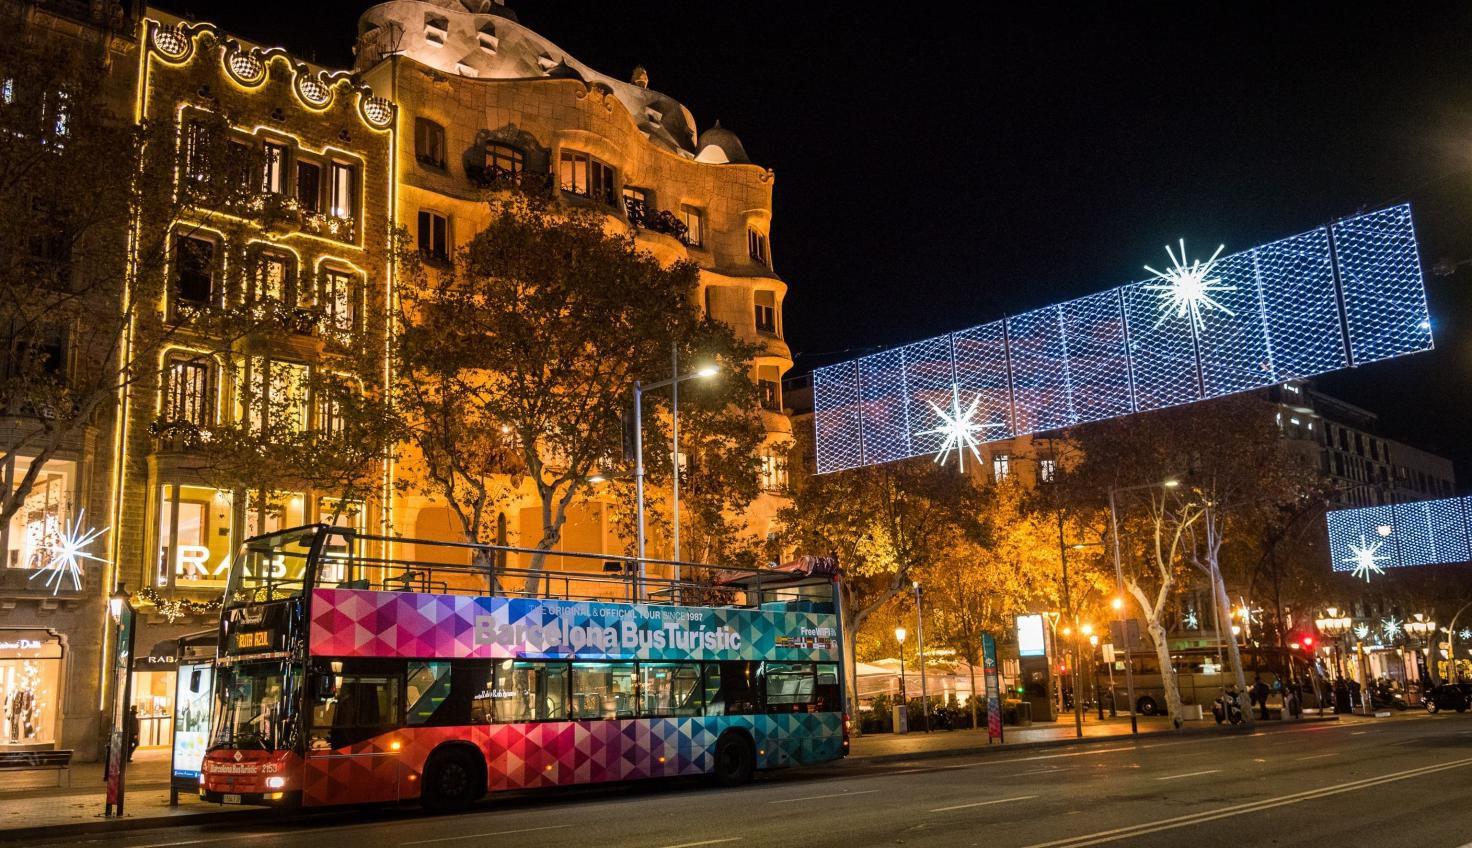 barcelona-bus-turistico-navidad.jpg